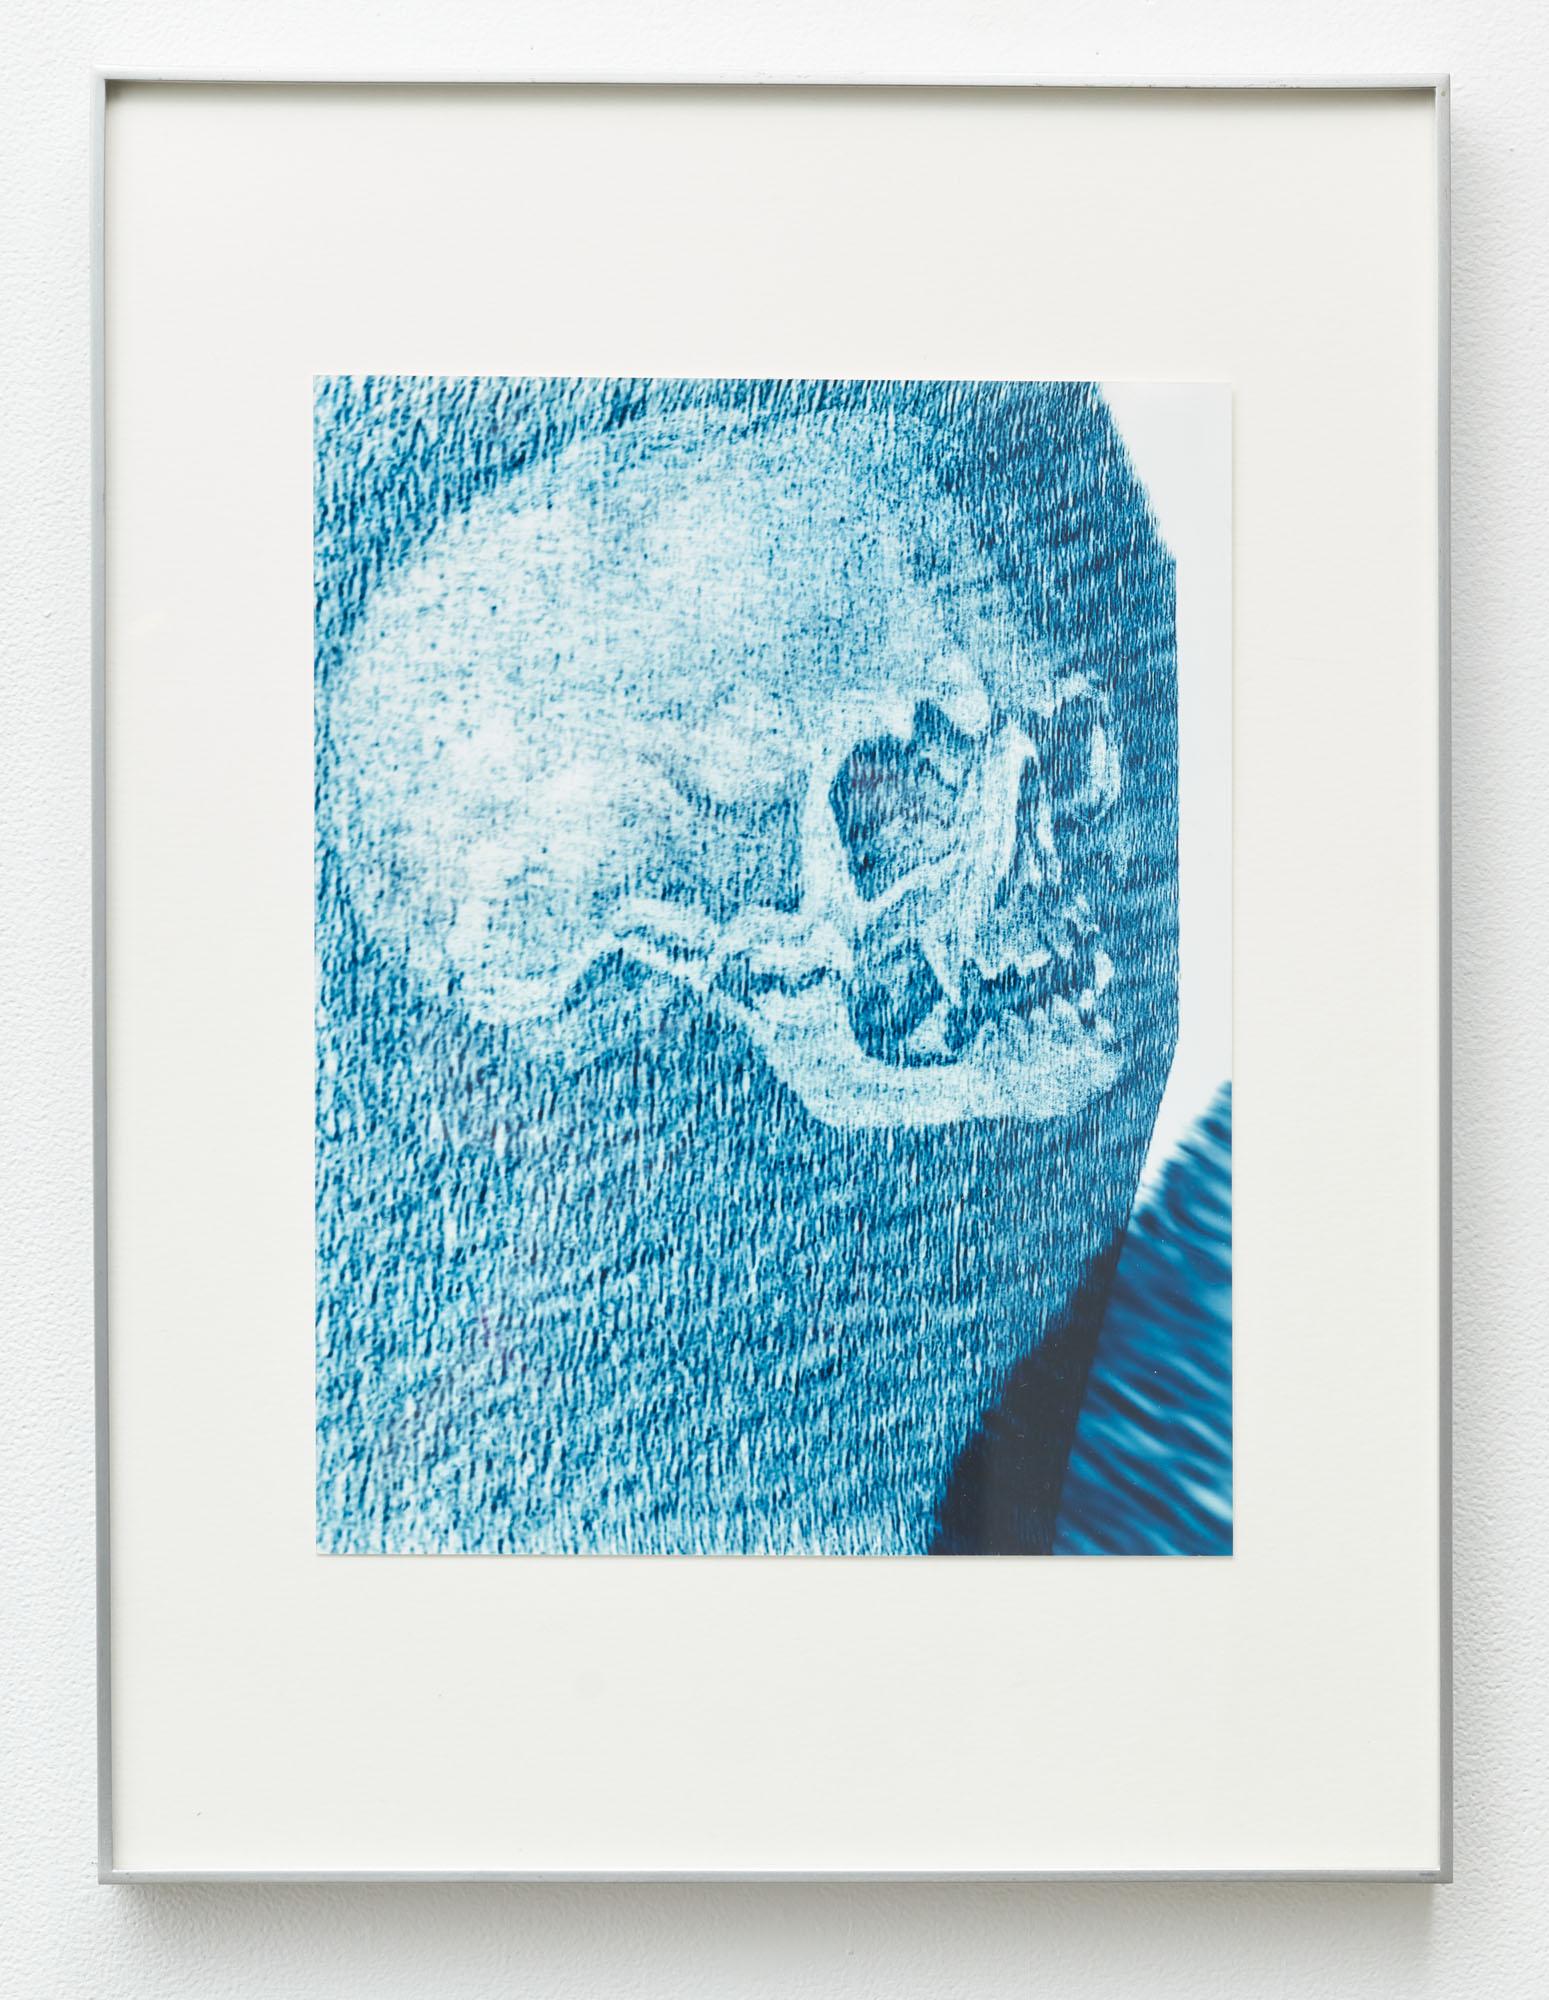 Steve Pauley, Blue Ghost, 2014